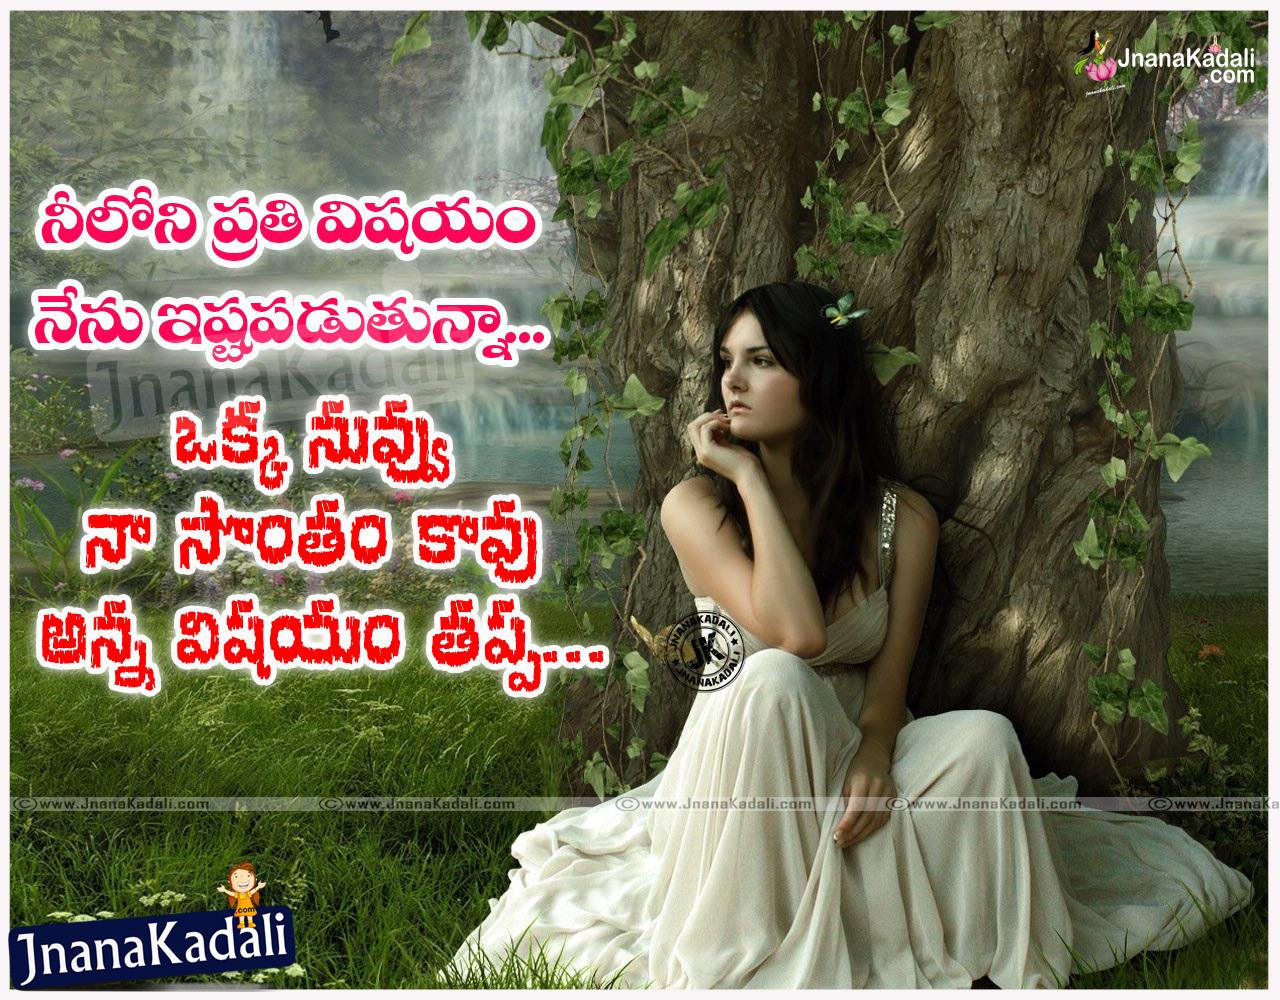 Telugu Love Failure Hd Wallpaper Best Hd Wallpaper